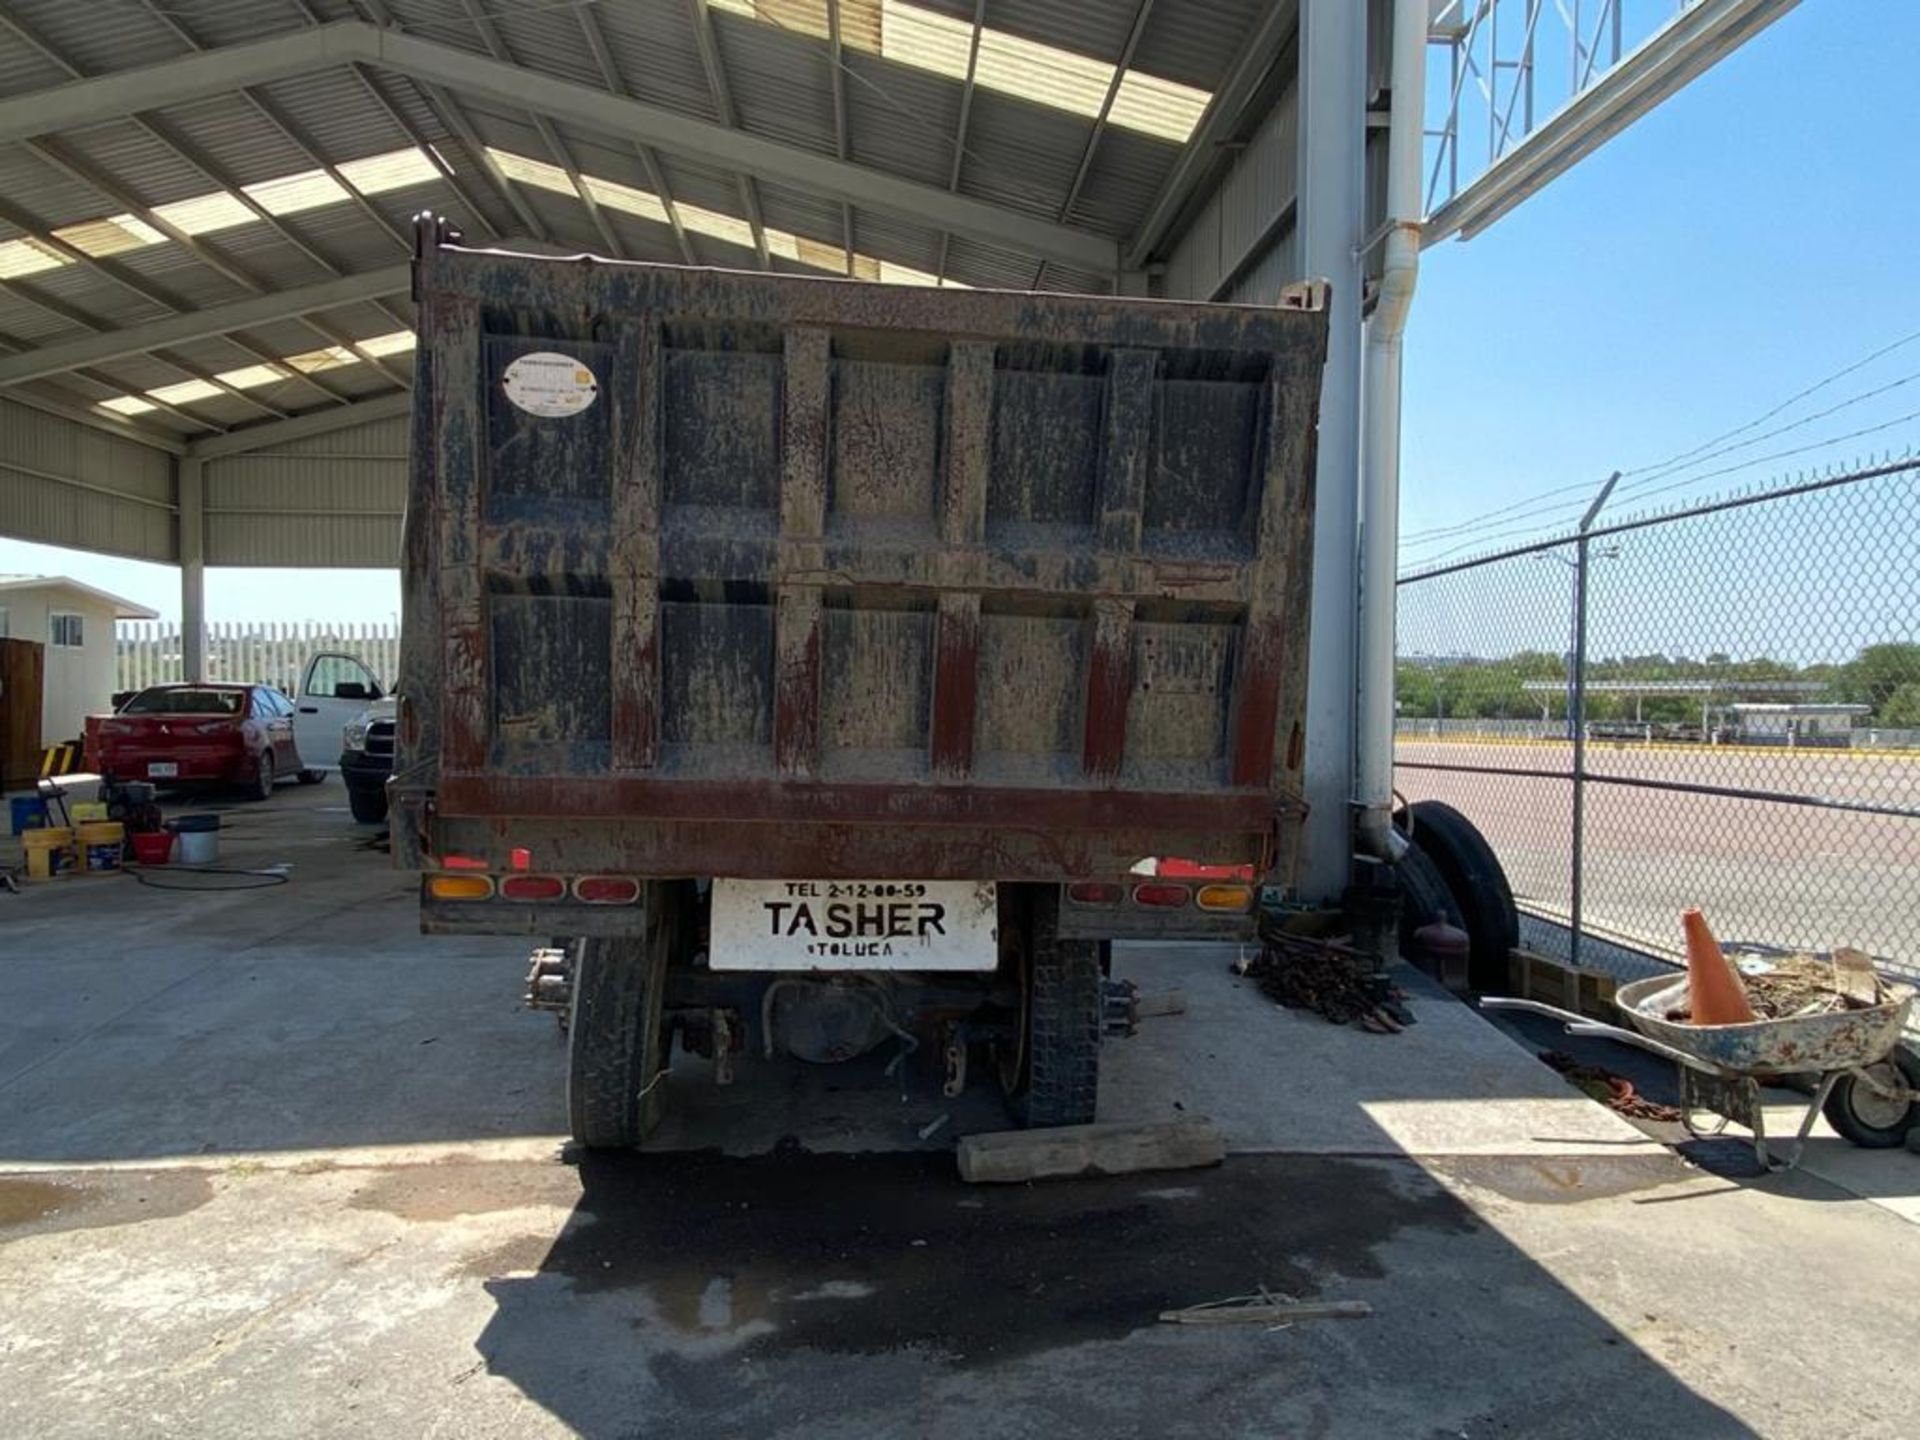 1983 Kenworth Dump Truck, standard transmission of 10 speeds, with Cummins motor - Image 12 of 68